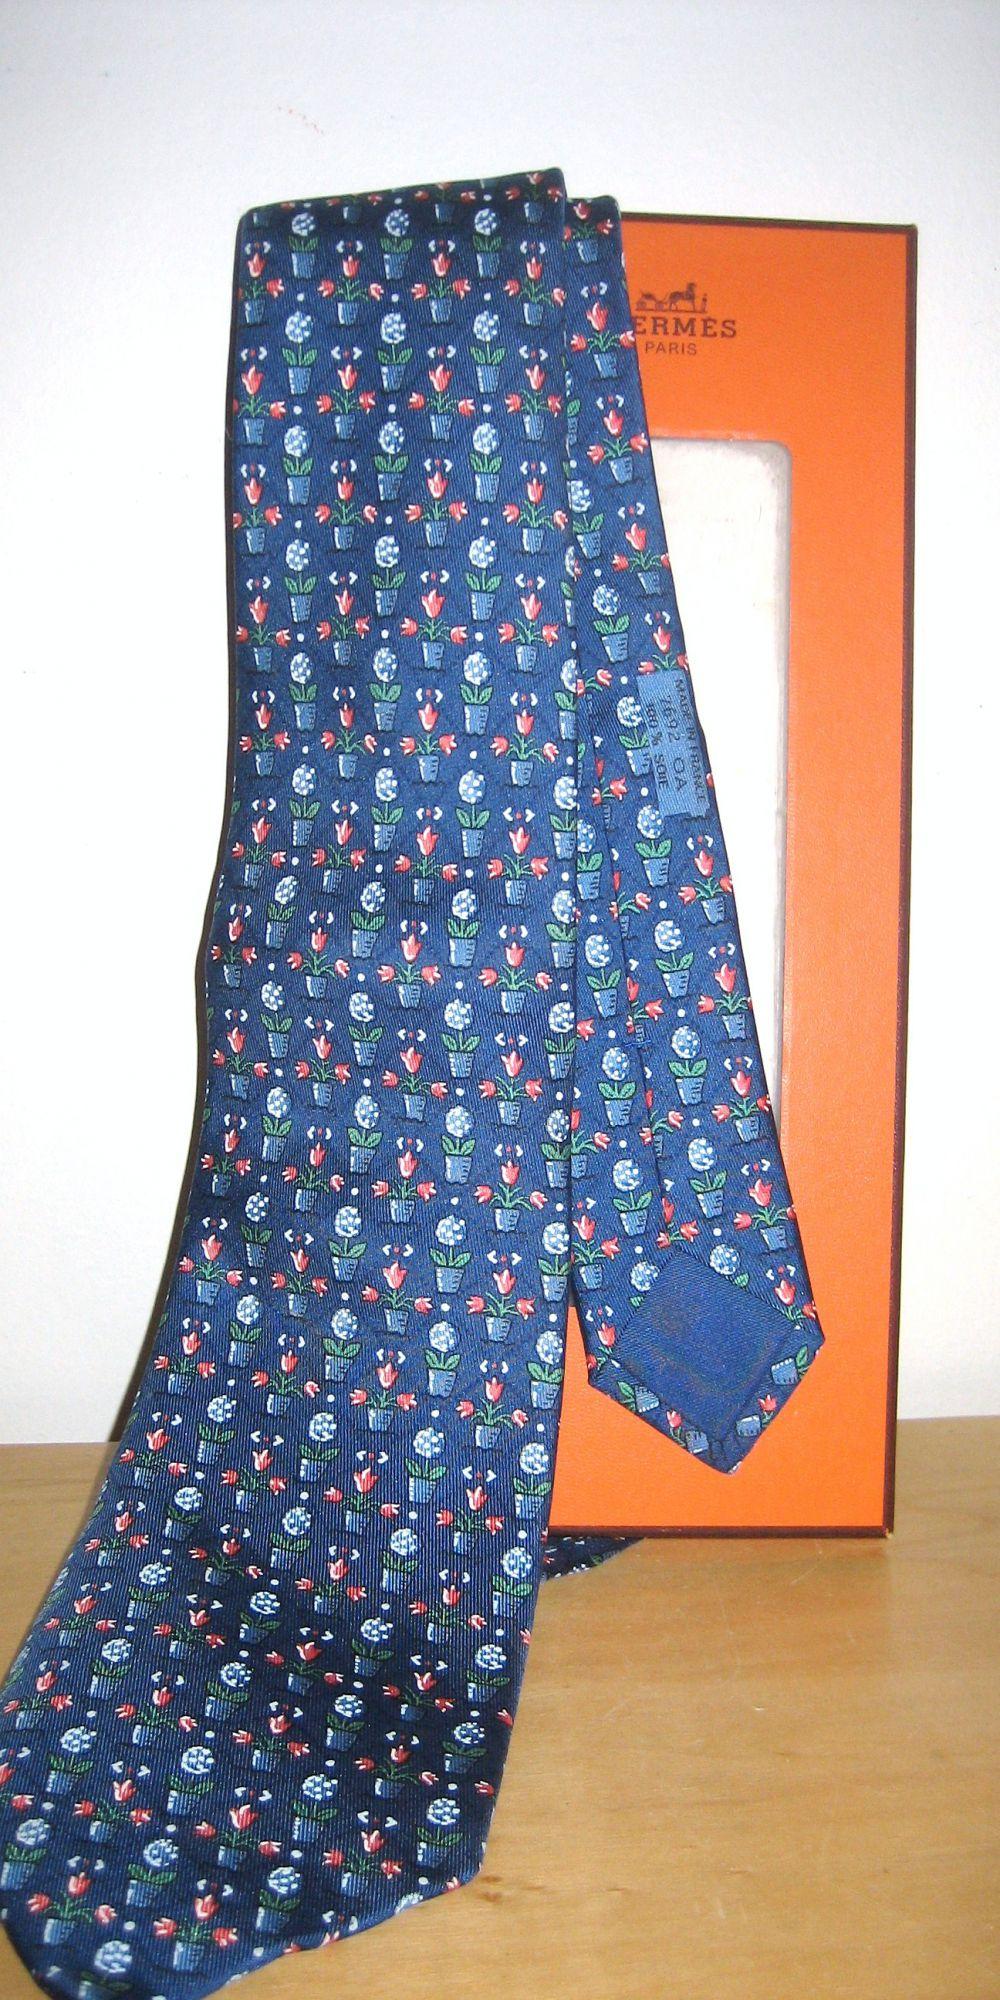 Cravate Hermès bleue 1